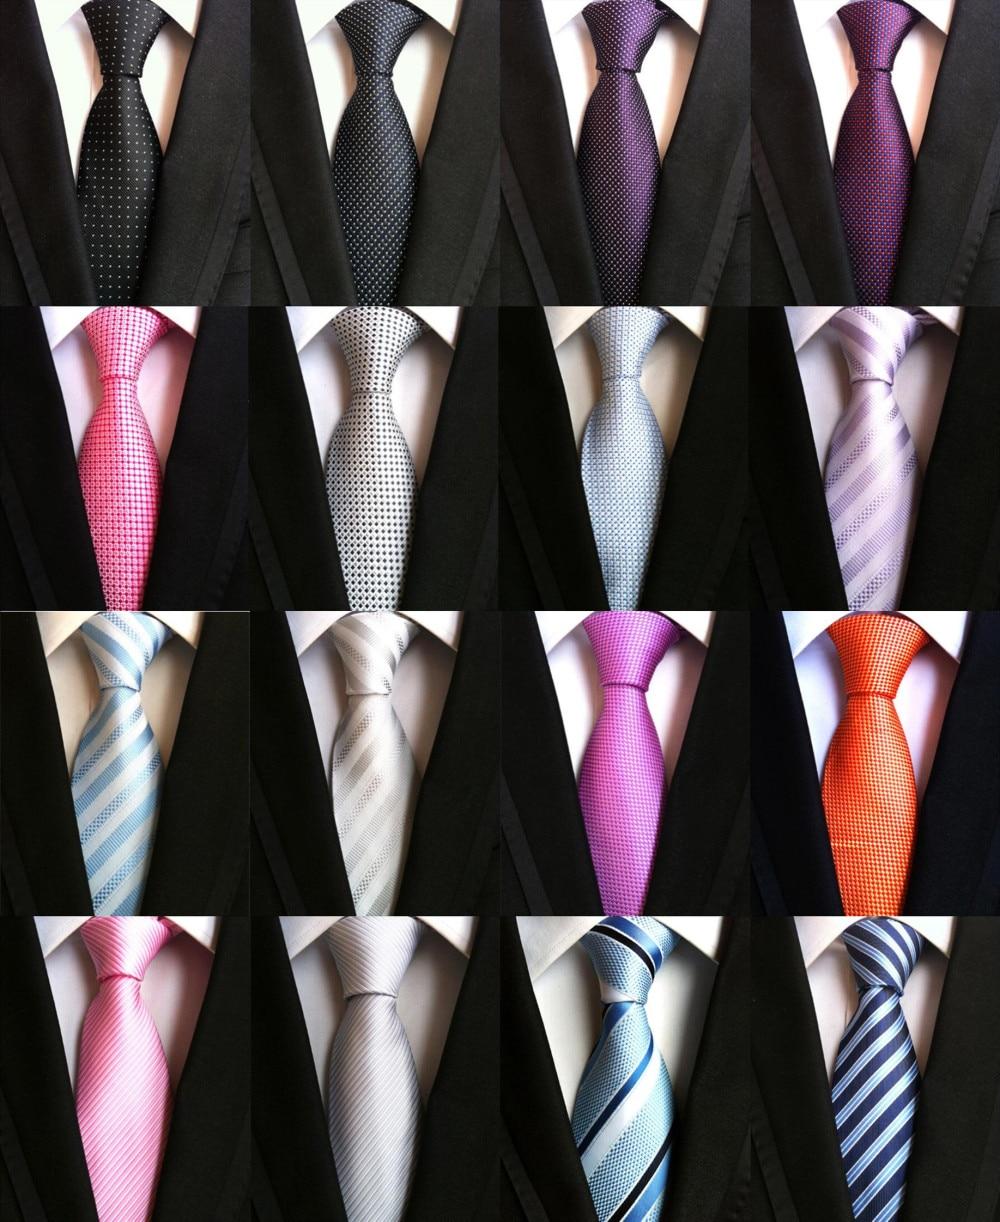 YISHLINE 8CM Fashion Classic Men's Stripe Tie Purple Blue Black Pink Lavender Jacquard Woven 100% Silk Necktie Polka Dots Ties